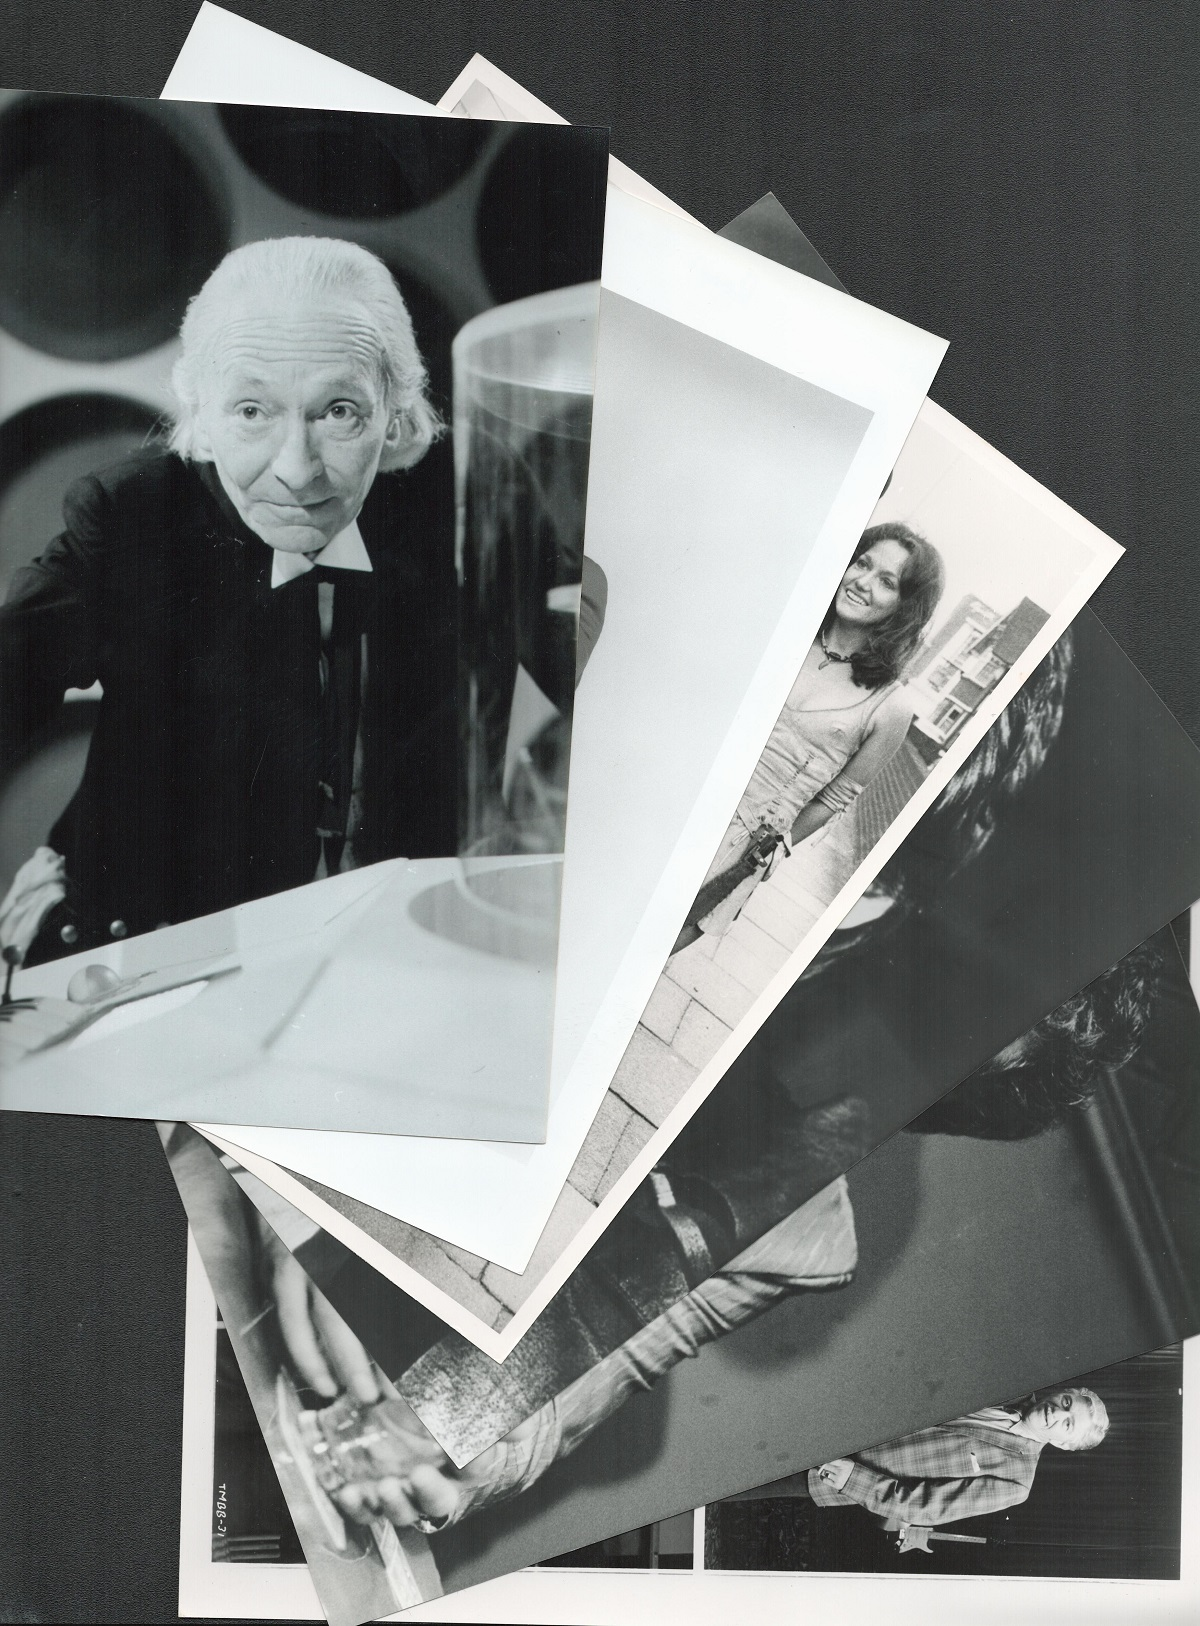 Films Over 70 B and W 8x10 Photographs Incs. Spencer Tracy, Mel Brooks, Steven Spielberg, Julie